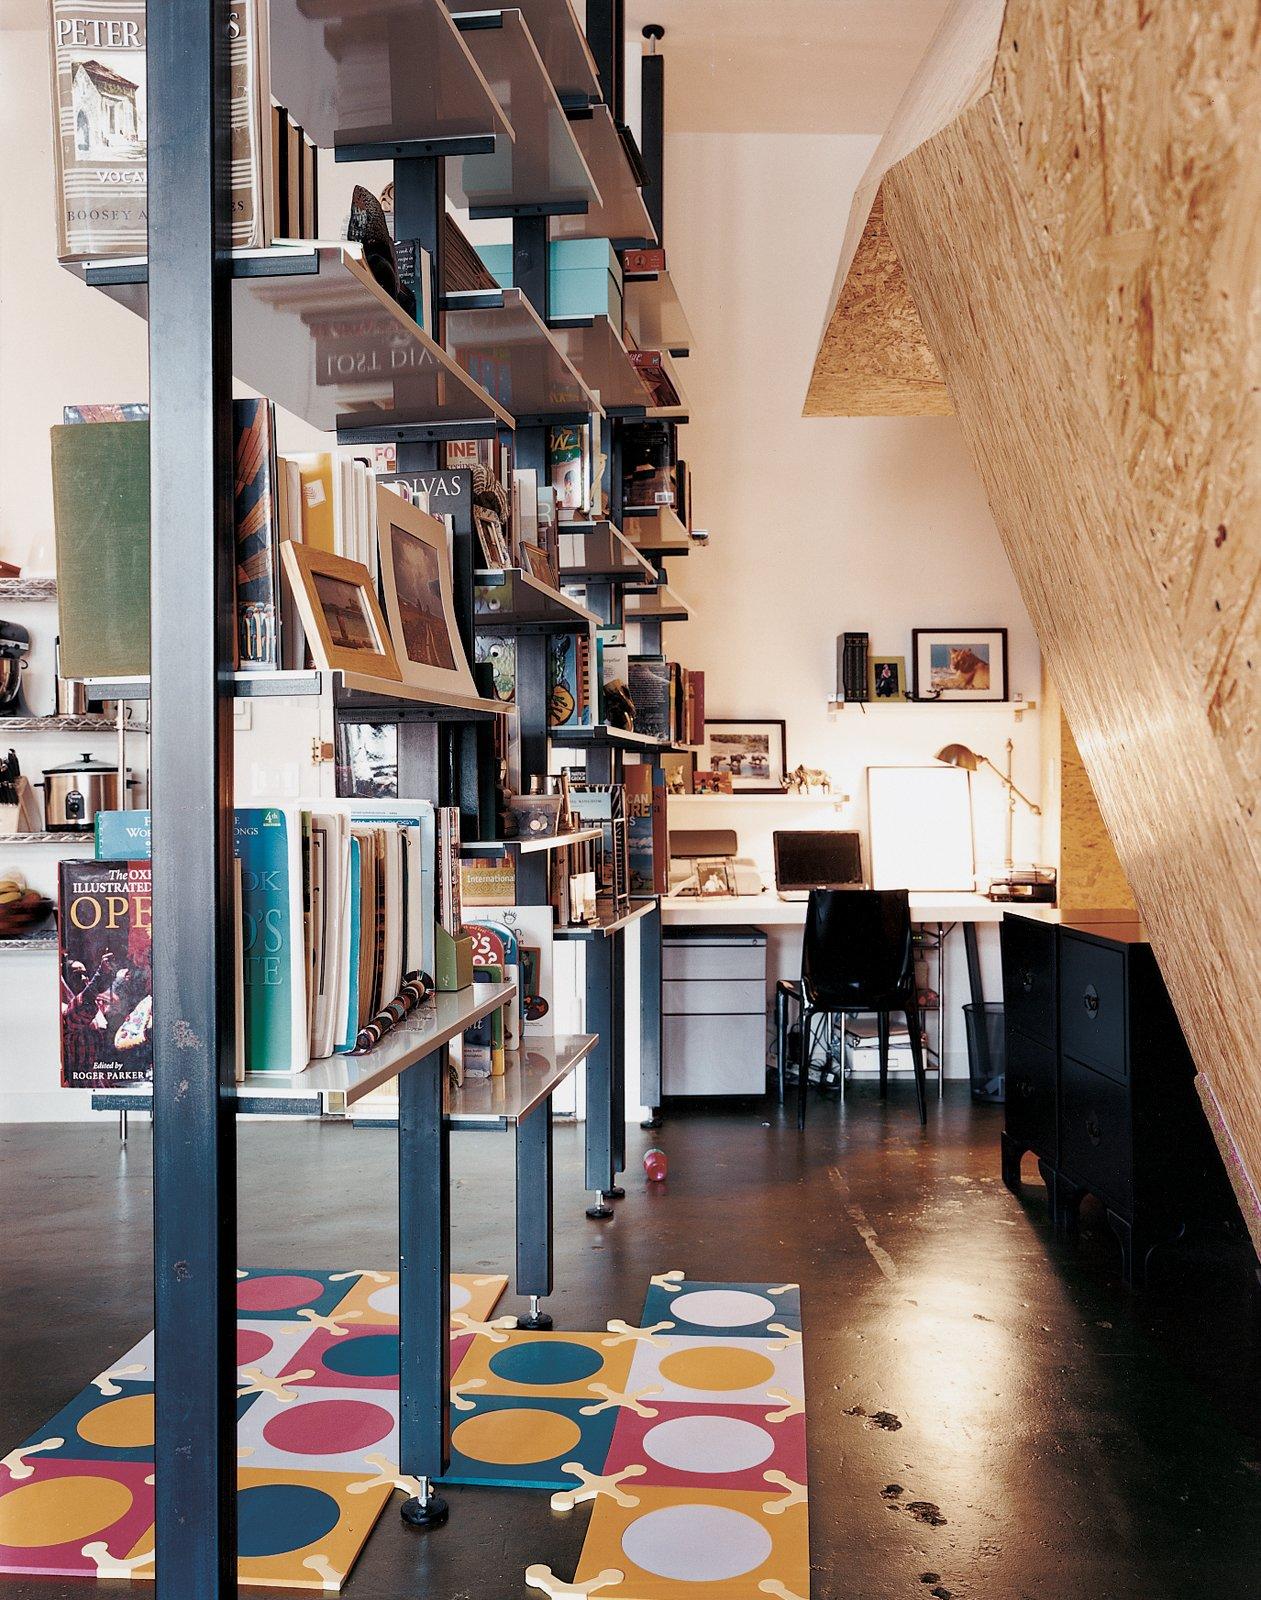 #workspace #office #interior #inside #window #seatingdesign #interiordesign #storage #shelf #lighting #modular #bookshelves #homeoffice    bookcase